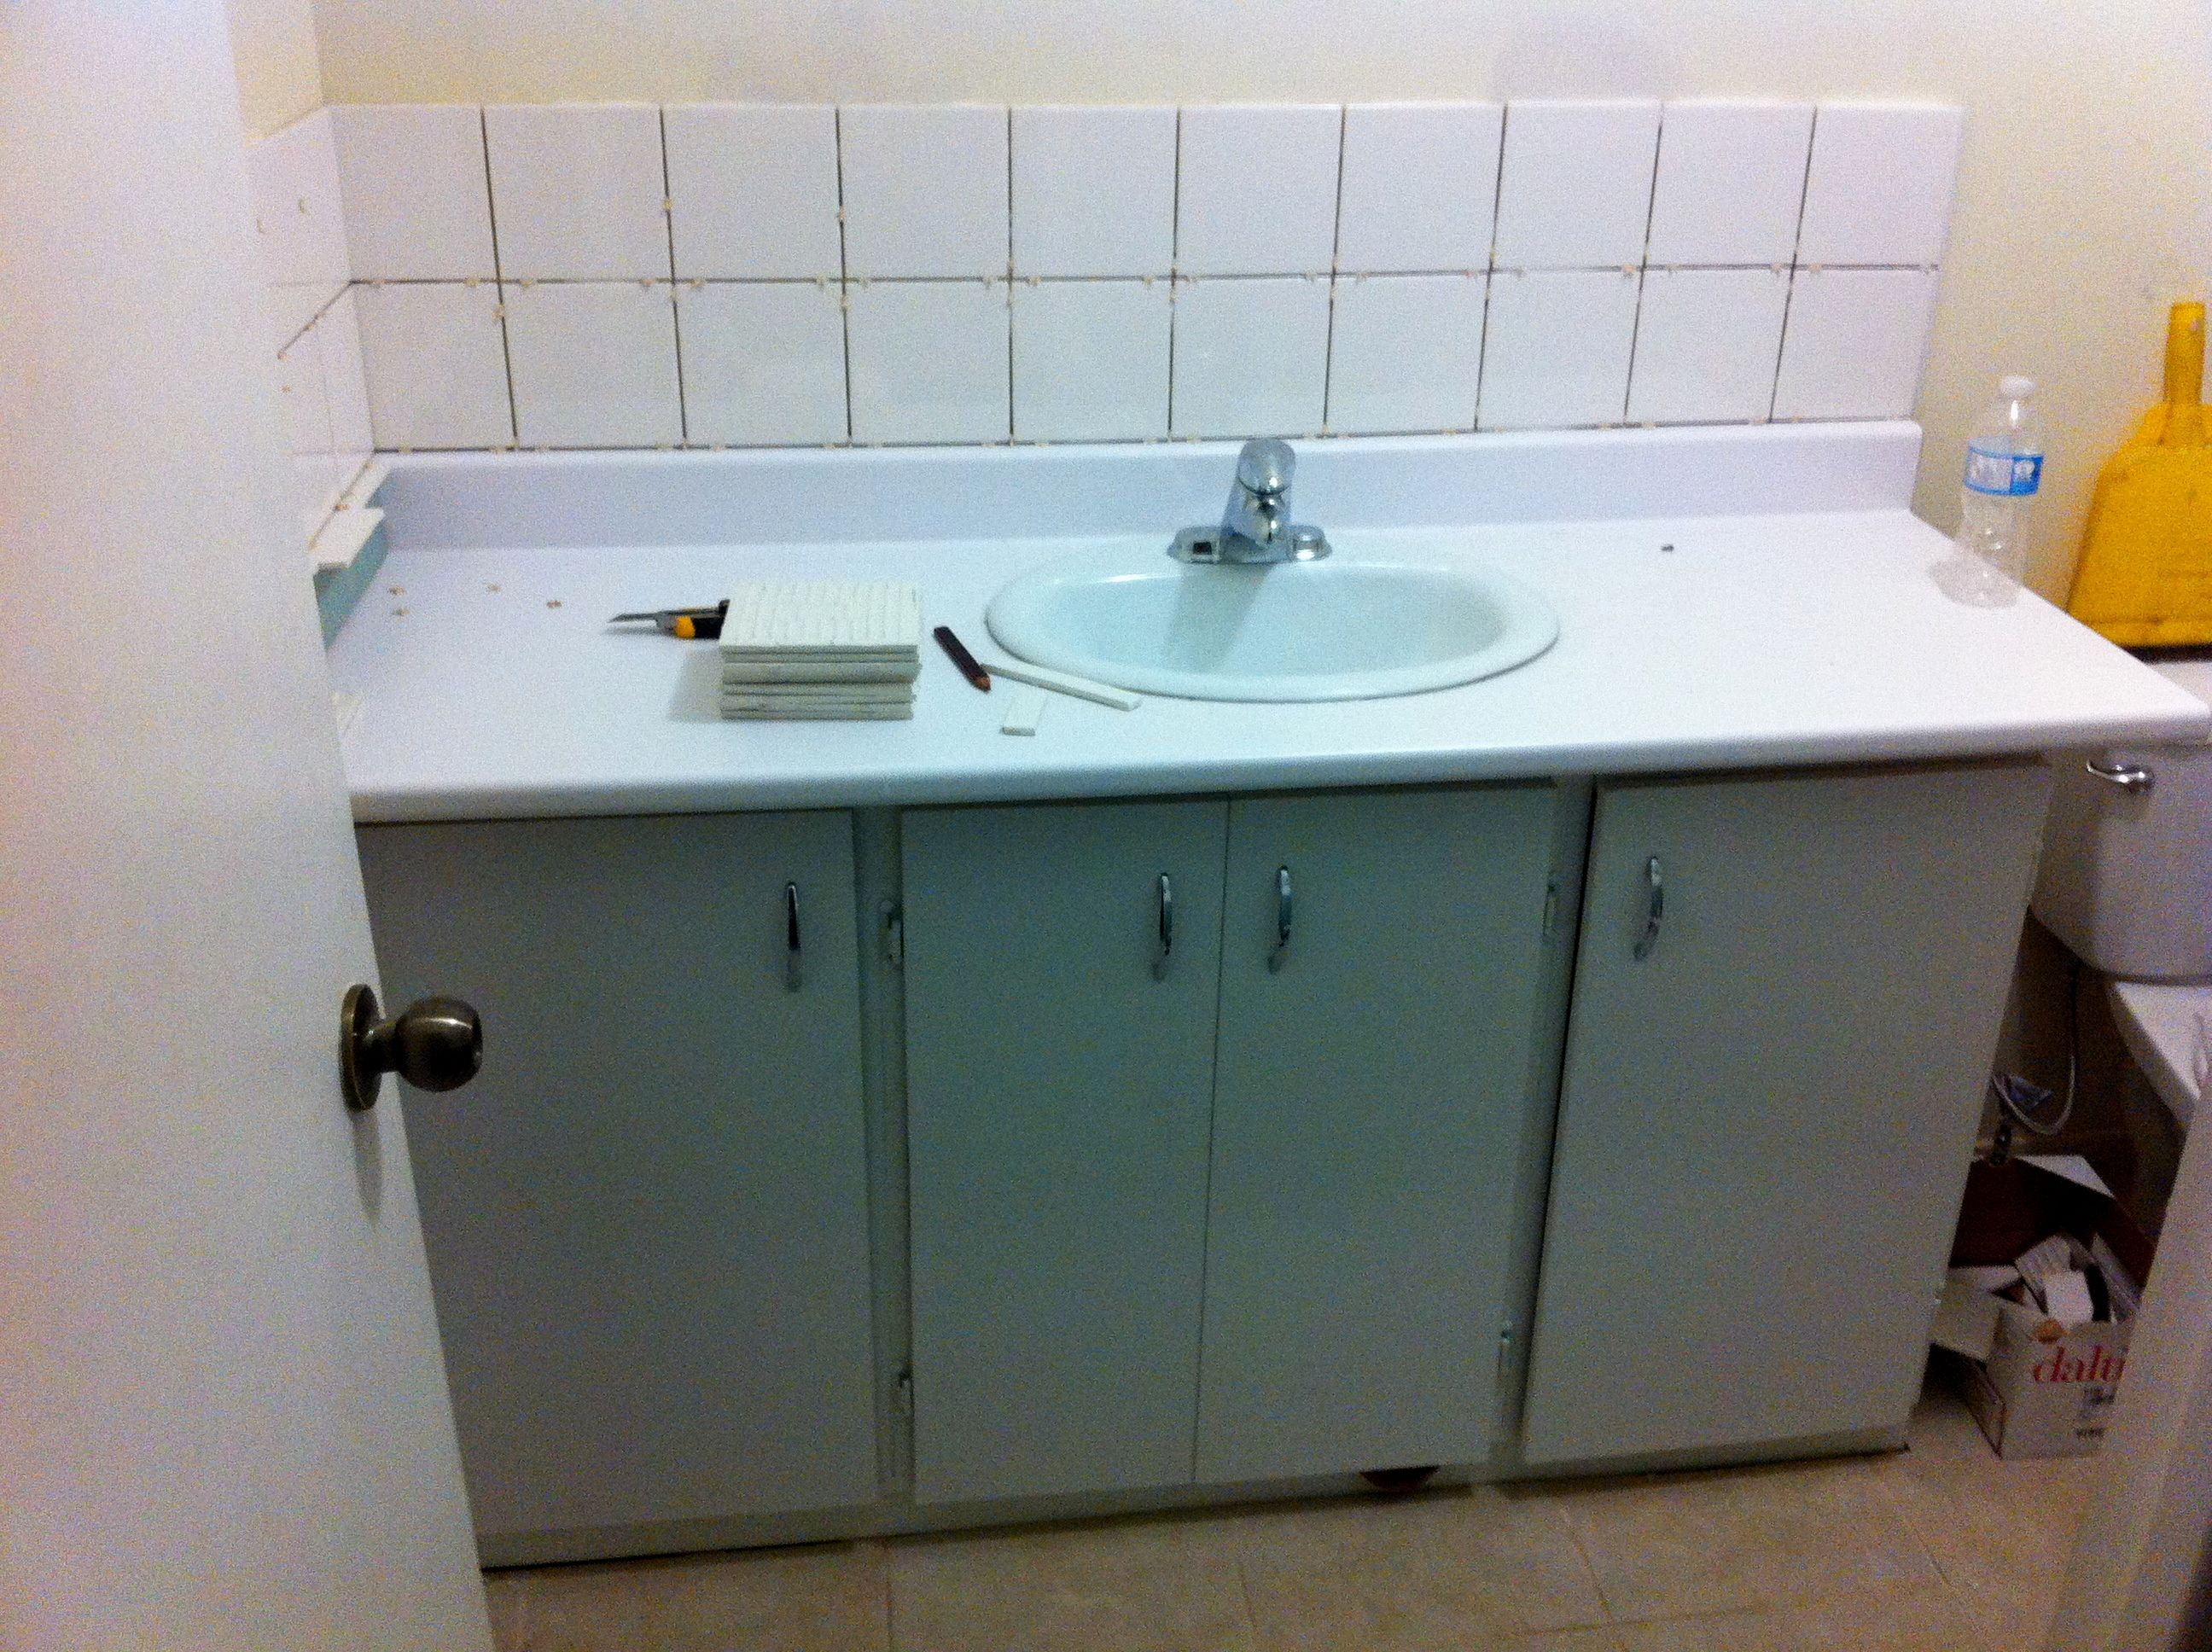 sensational undermount bathroom sinks online-New Undermount Bathroom Sinks Construction